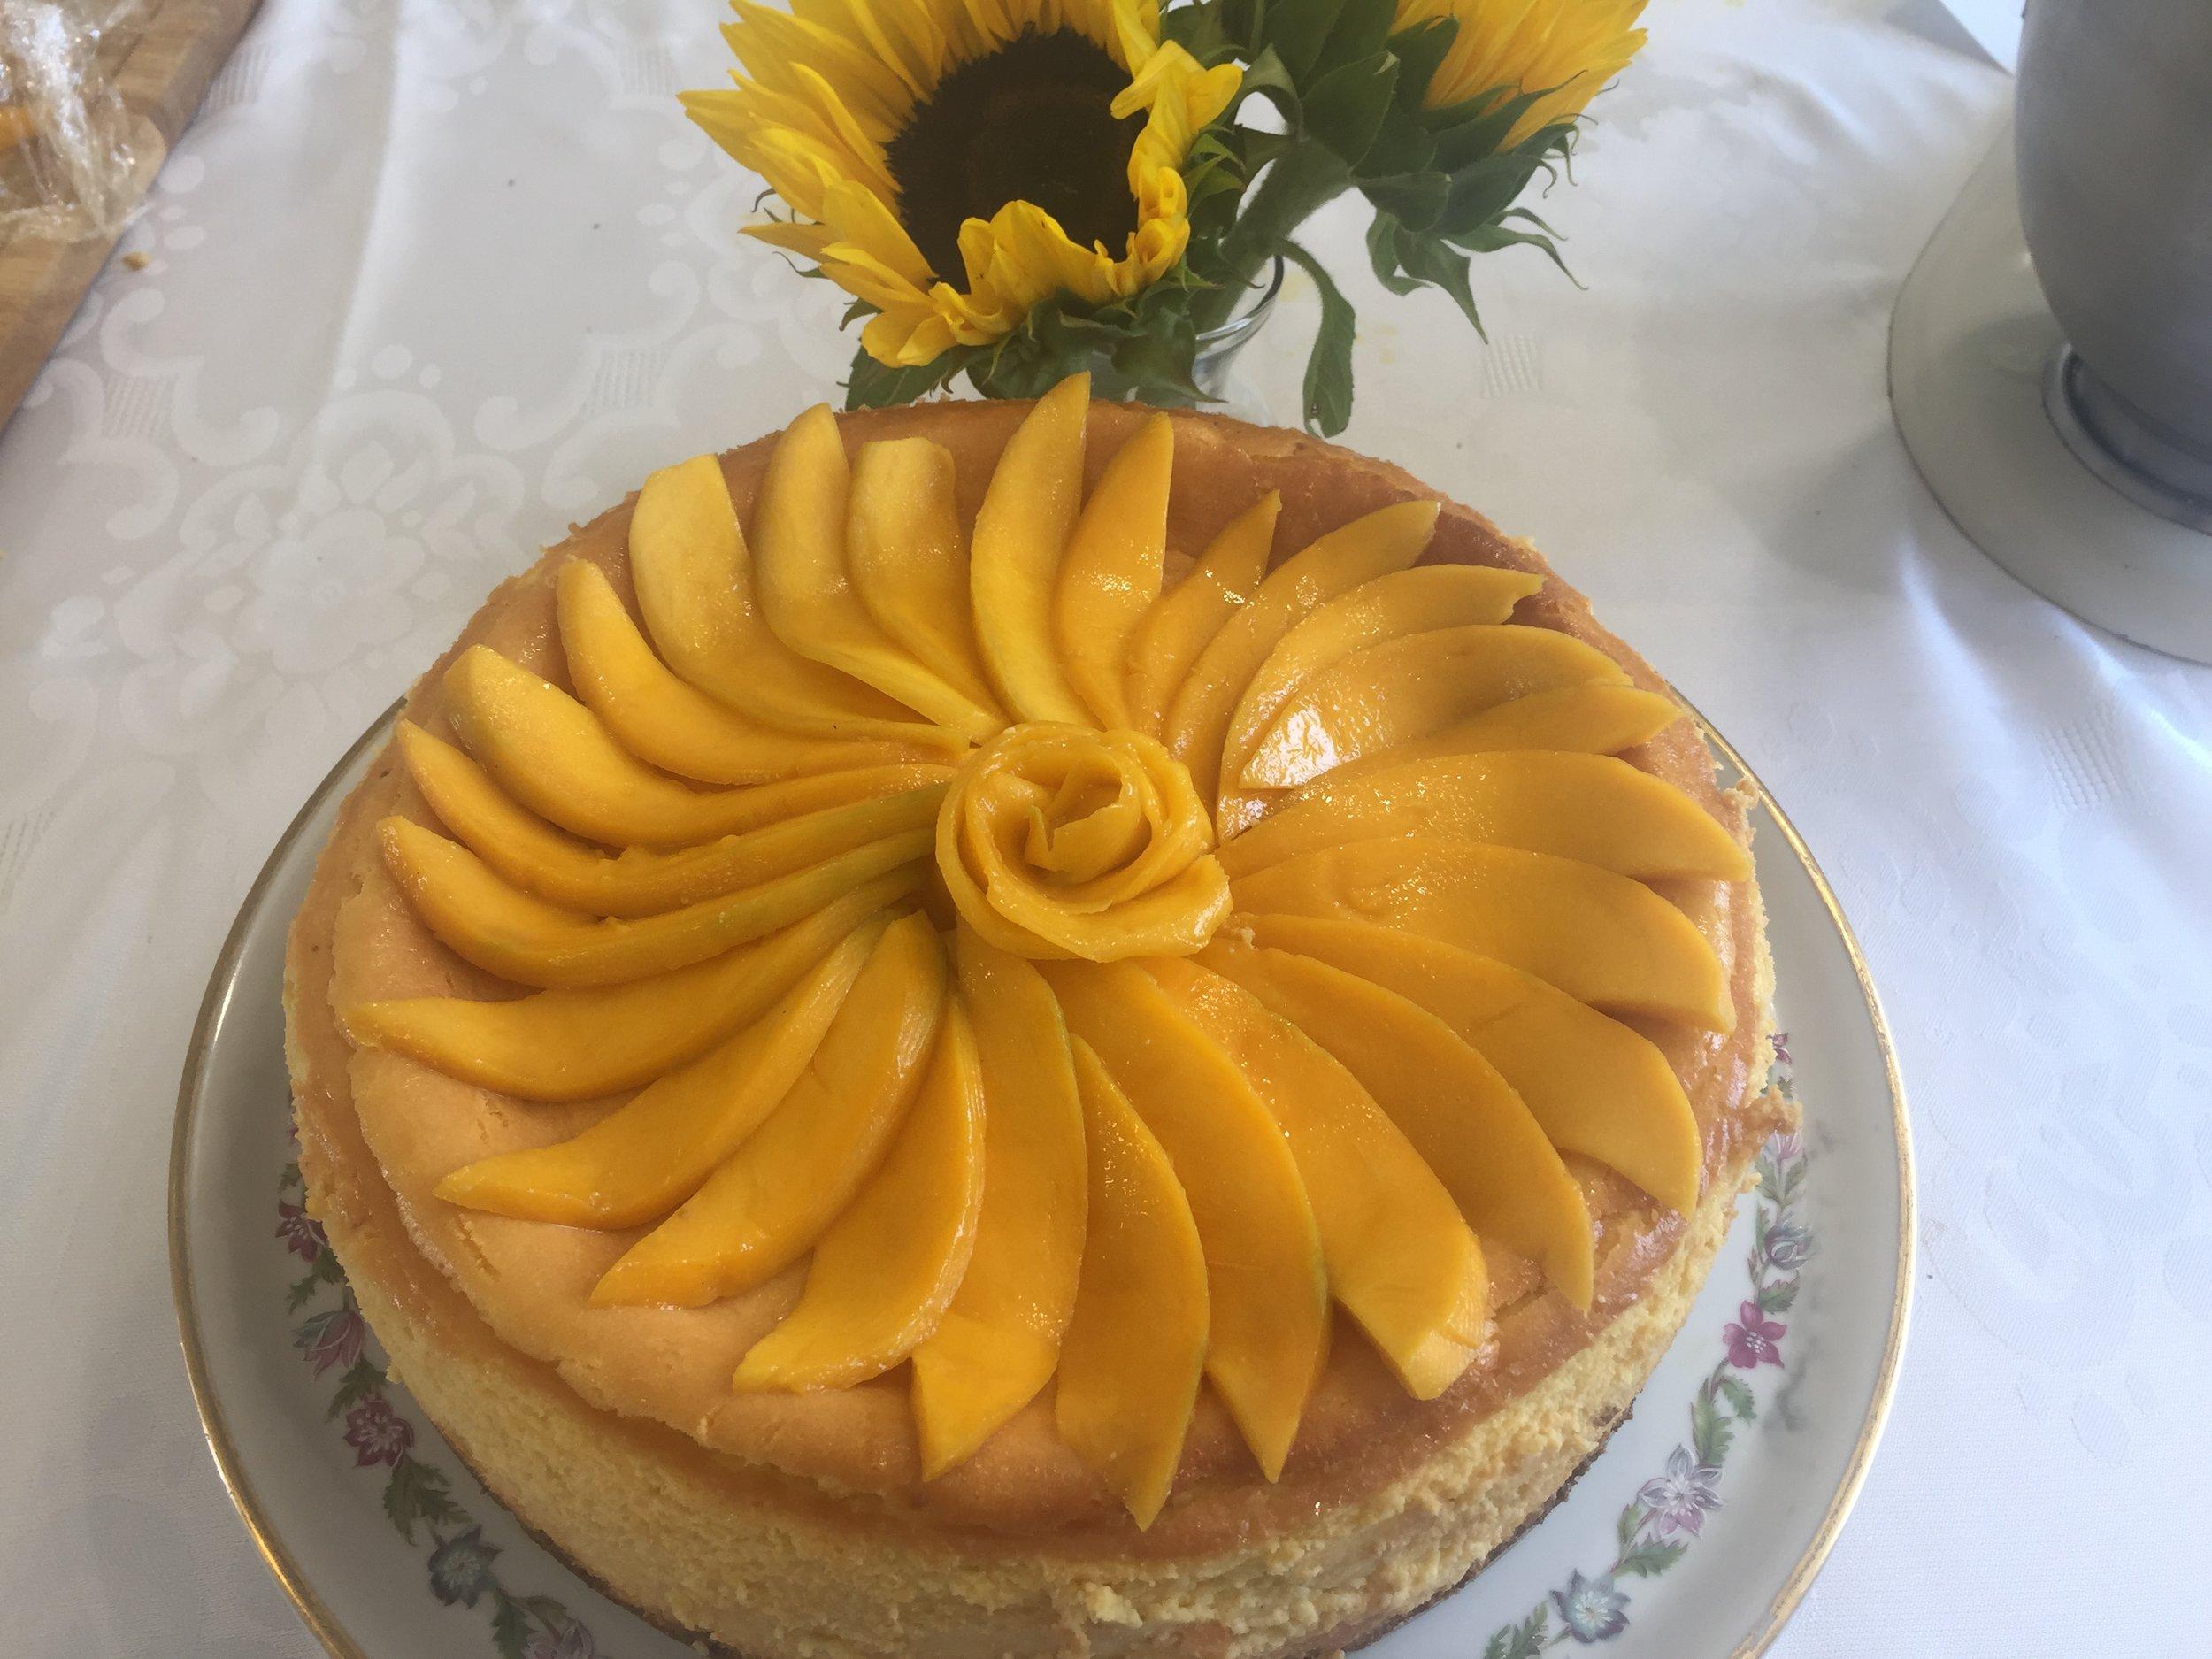 Mango cheesecake with gingersnap crust